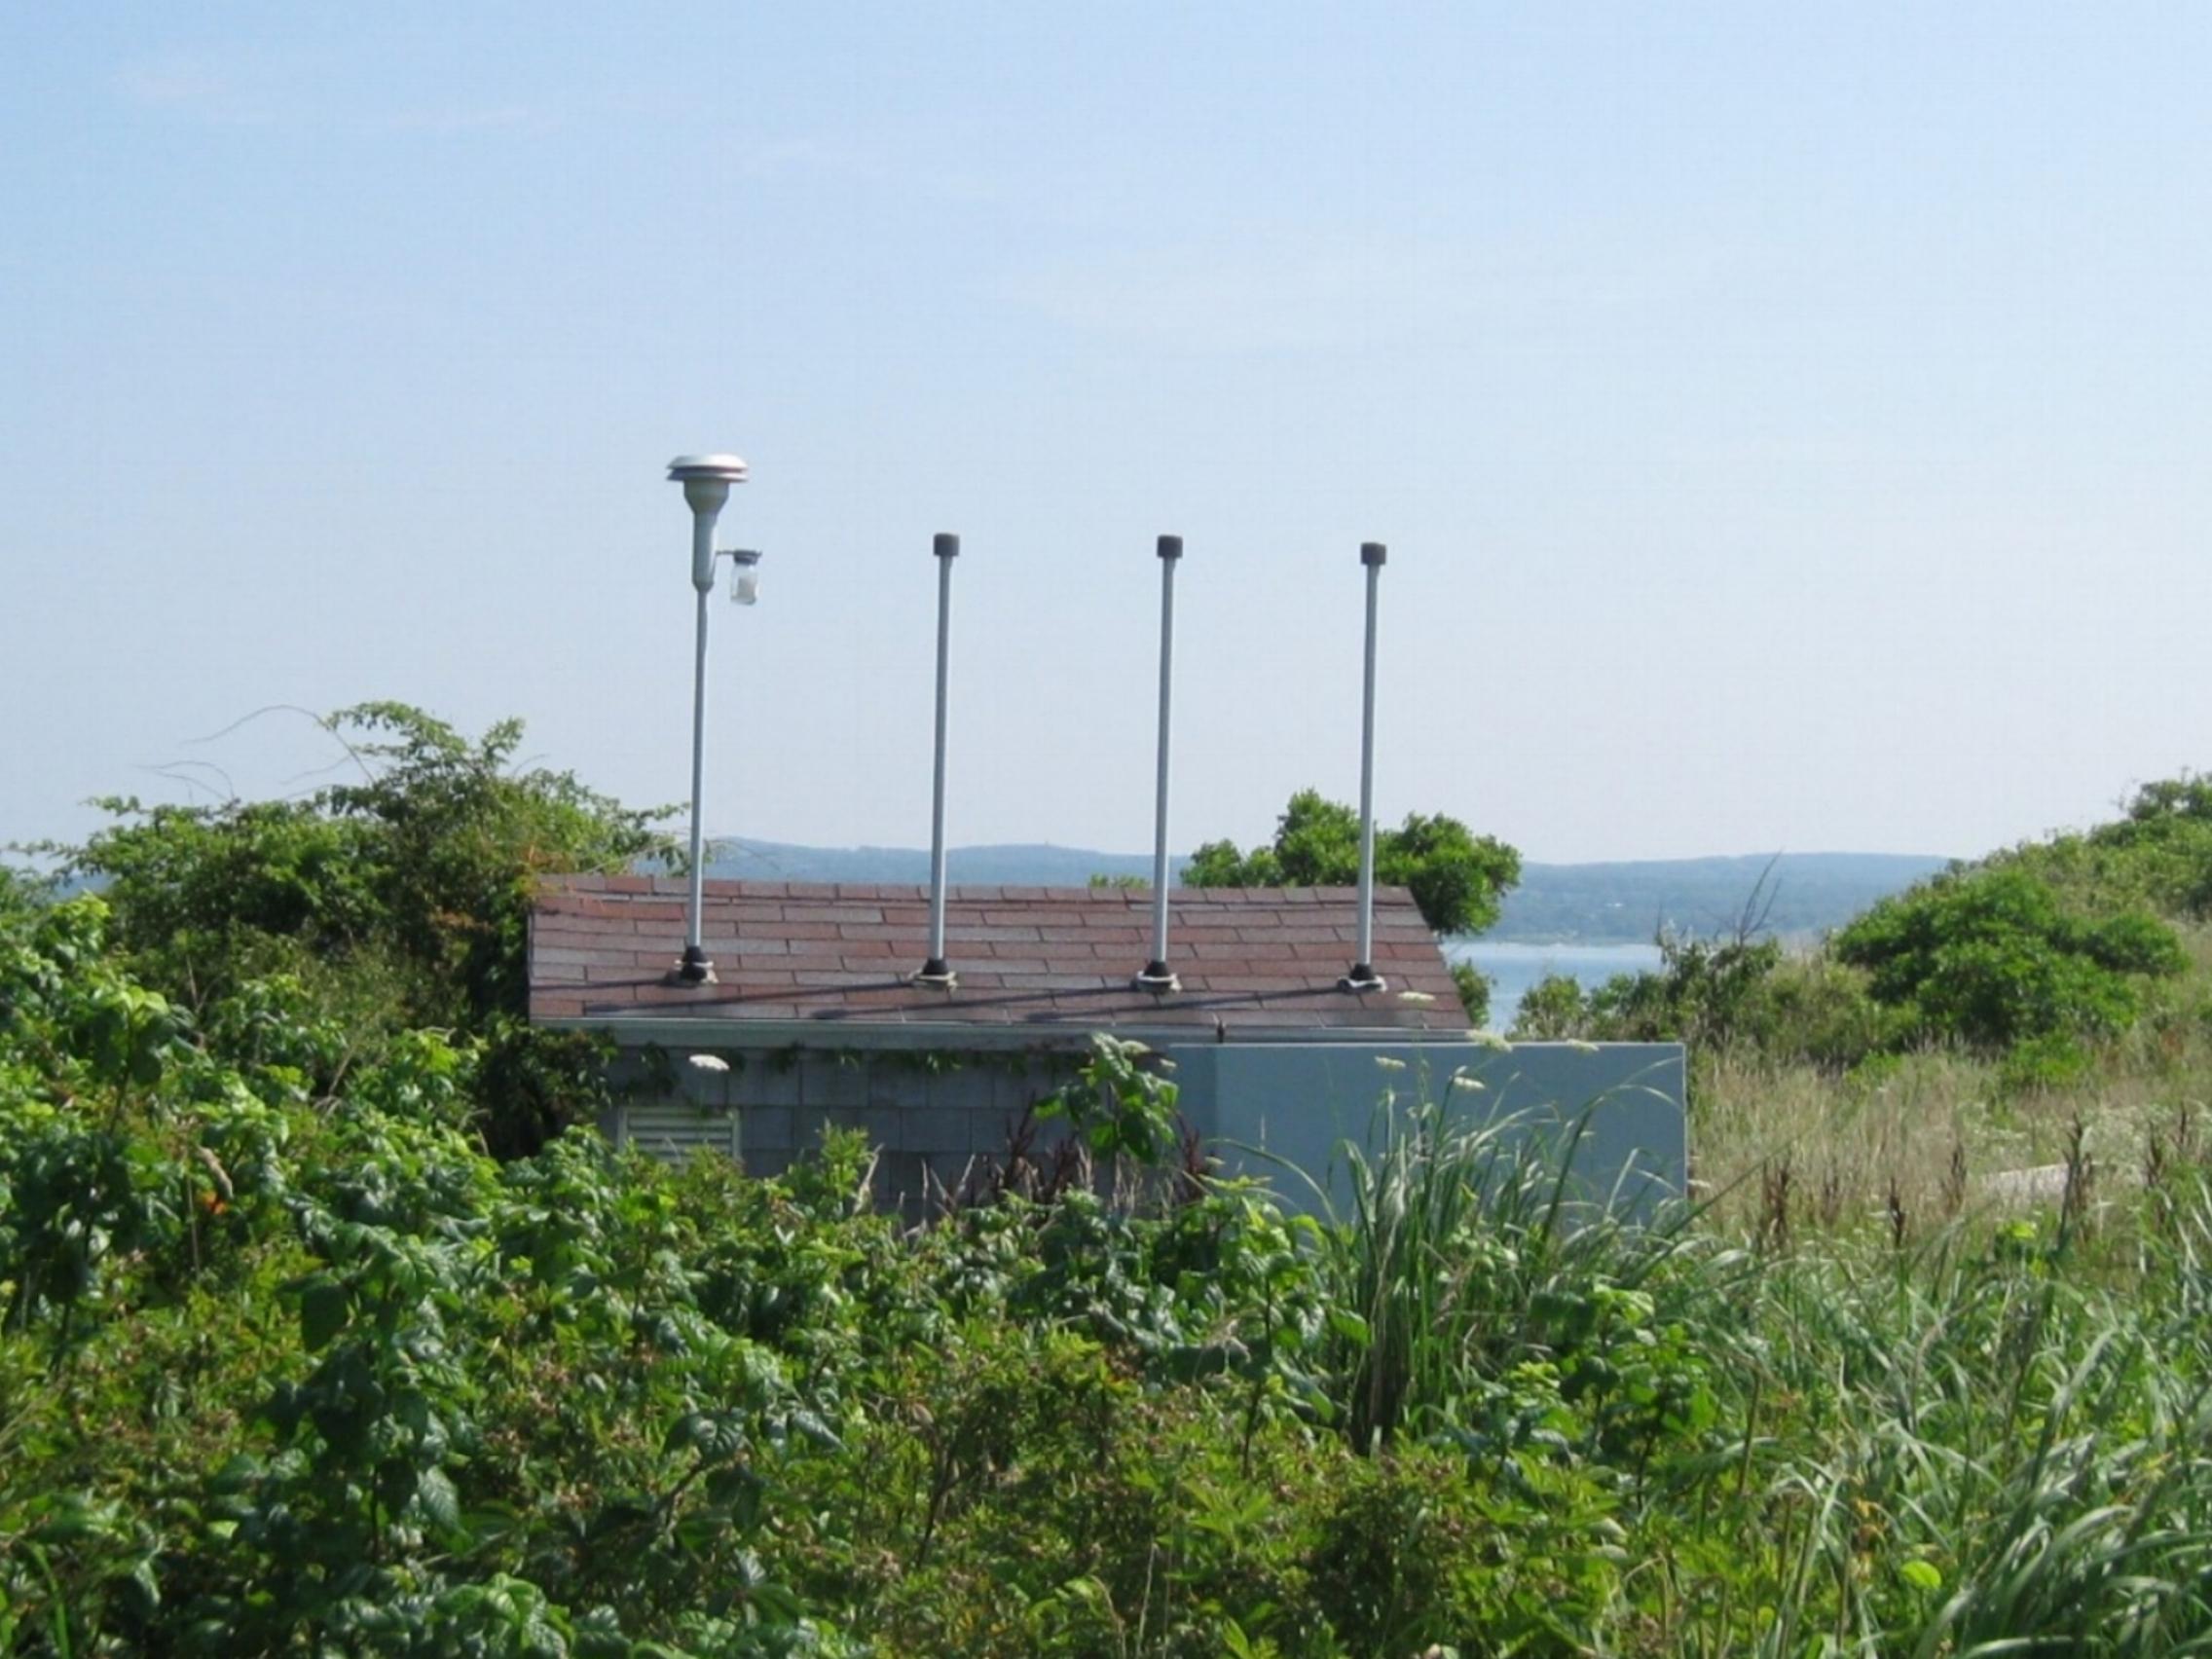 Air Monitor Housing/Sampling Site